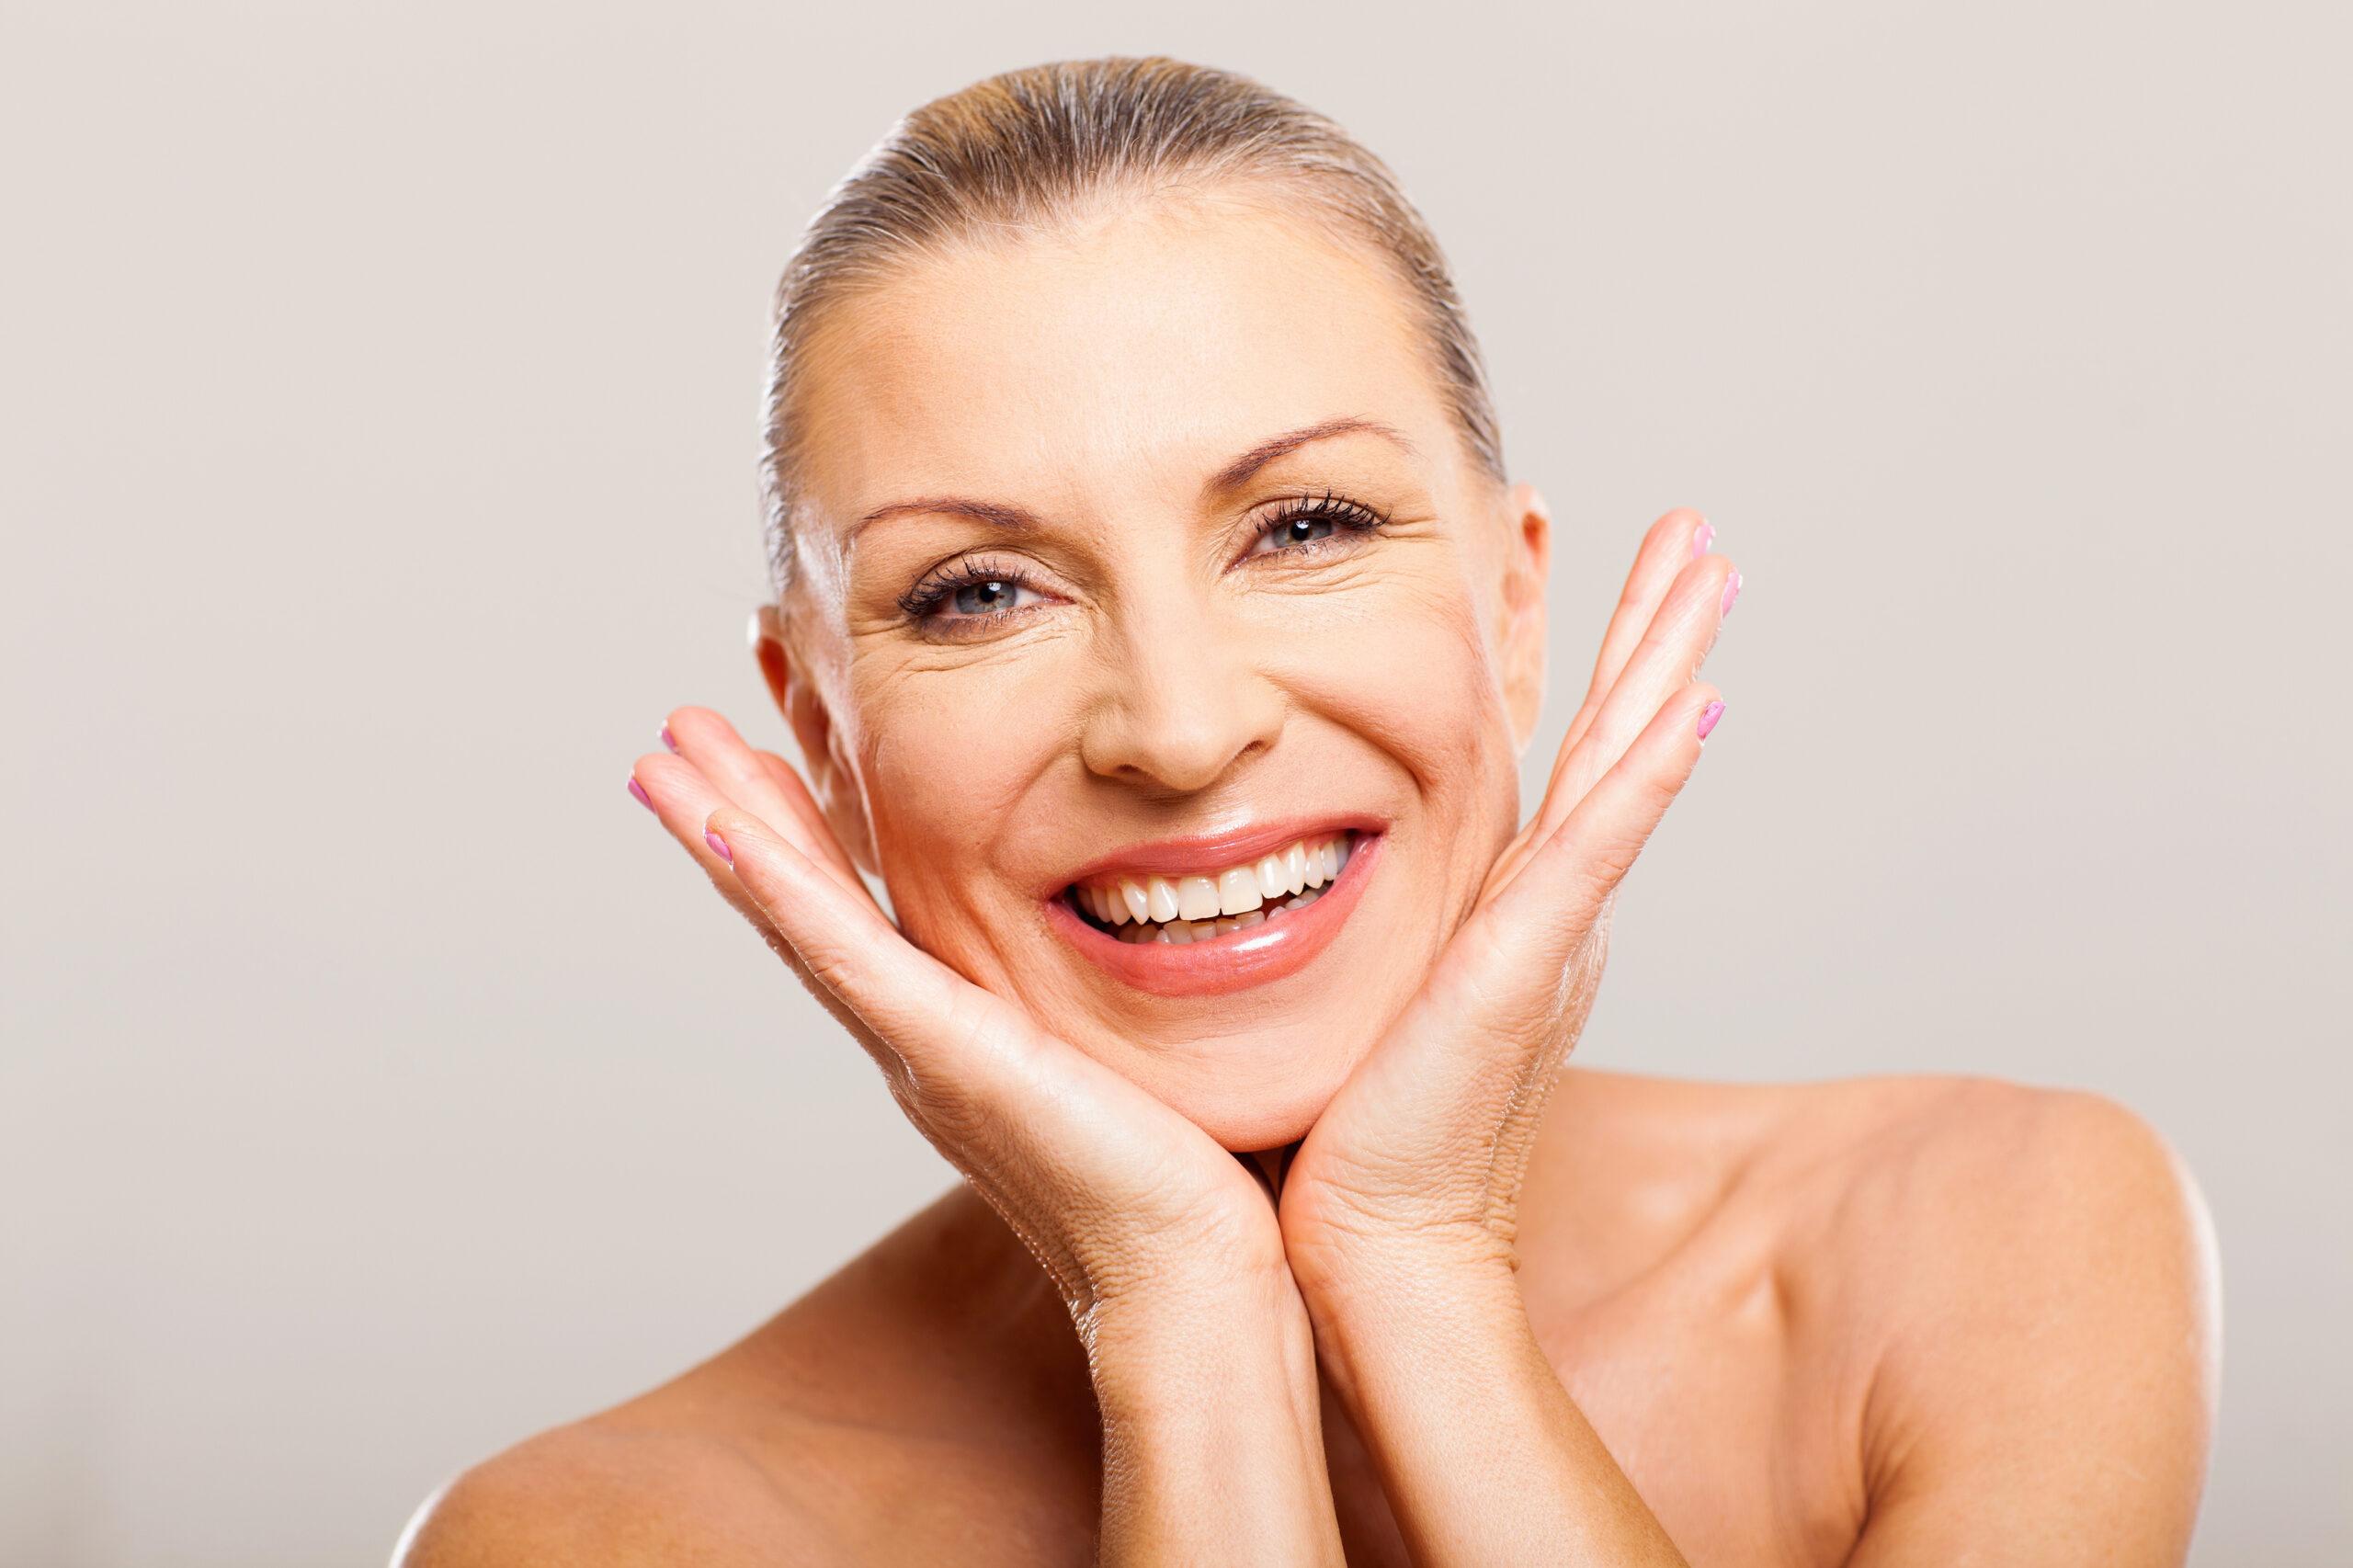 Facial plastic surgery